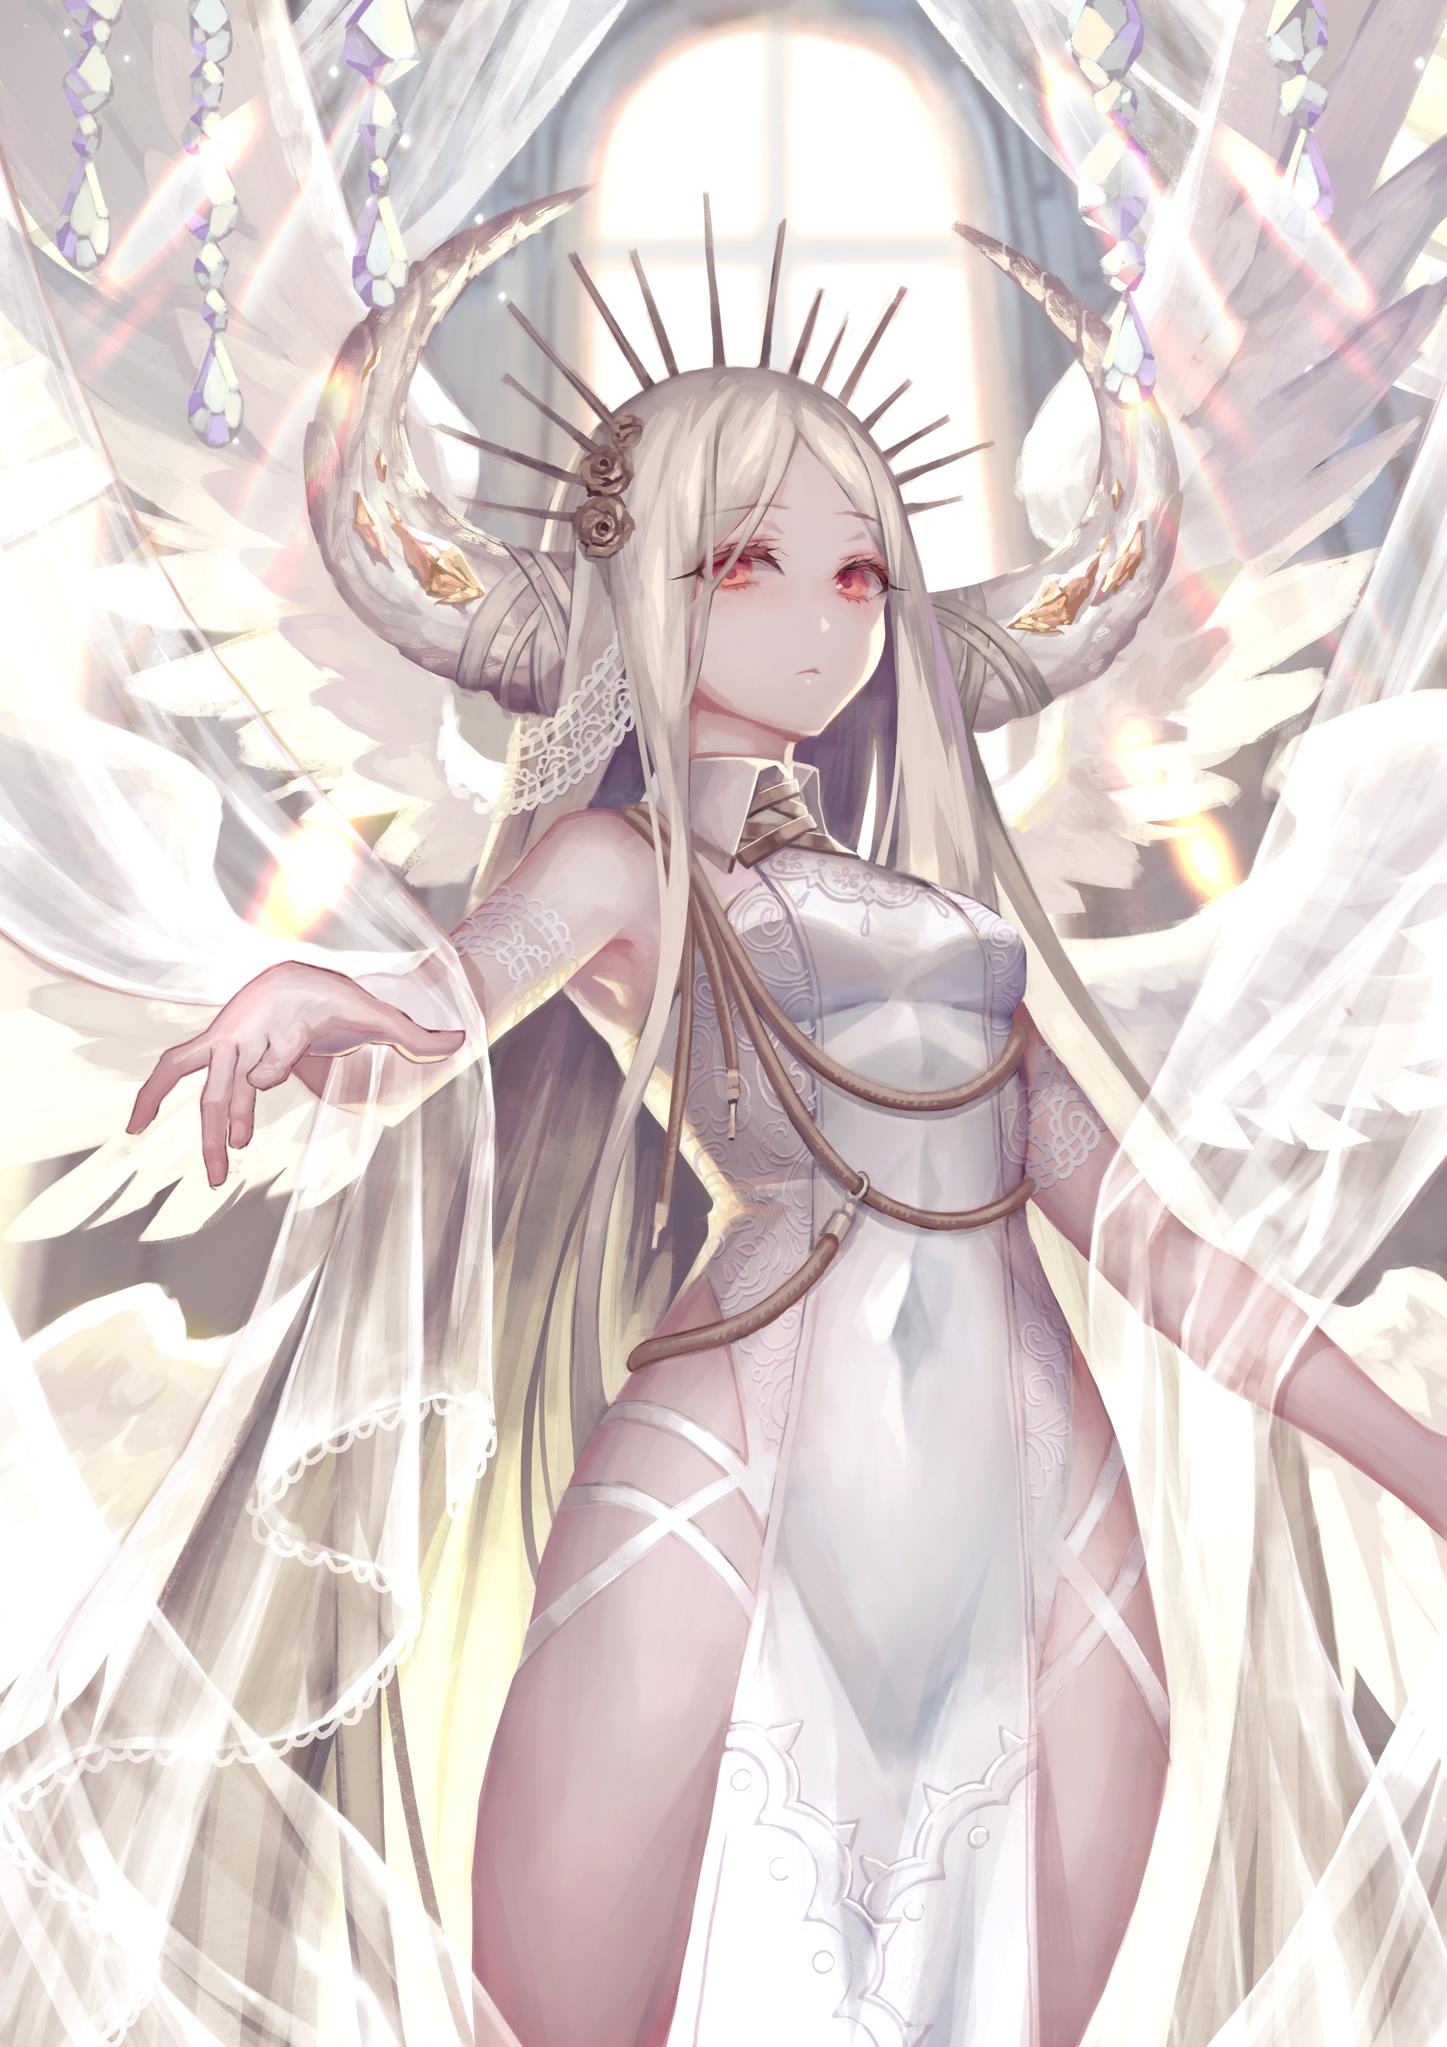 Sexy anime girl with white hair